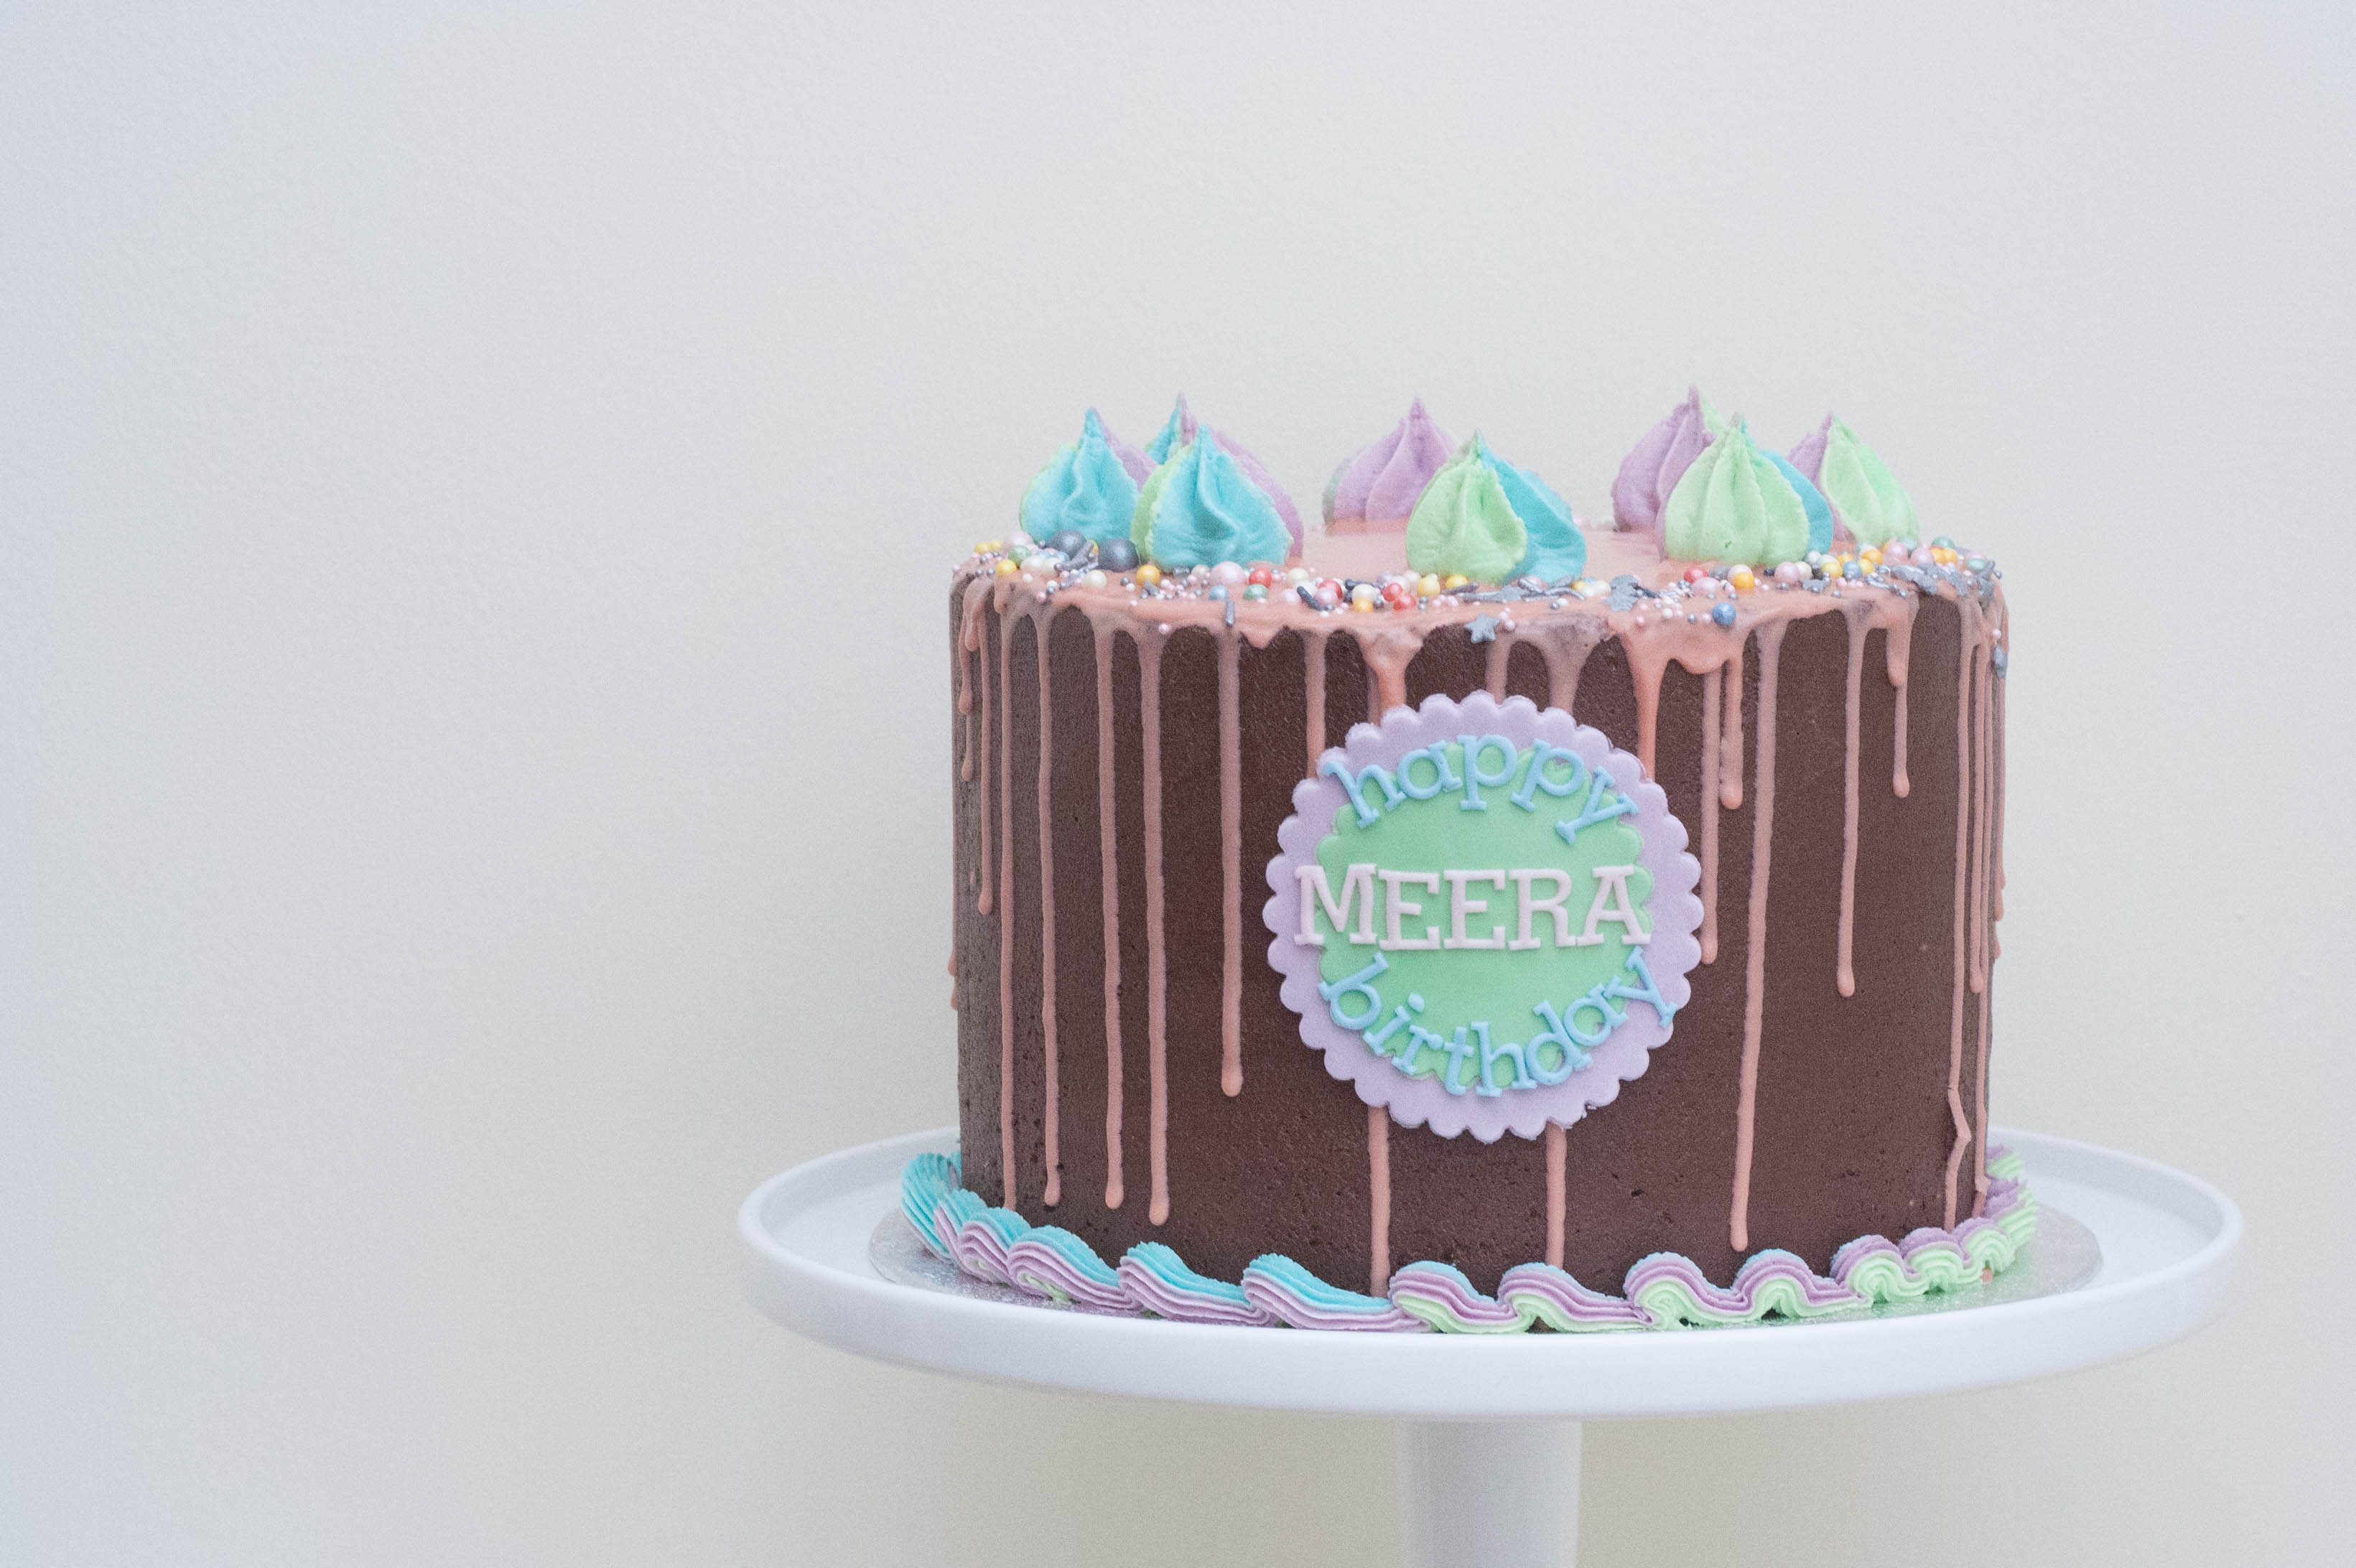 rainbow frosting choc cake vegan